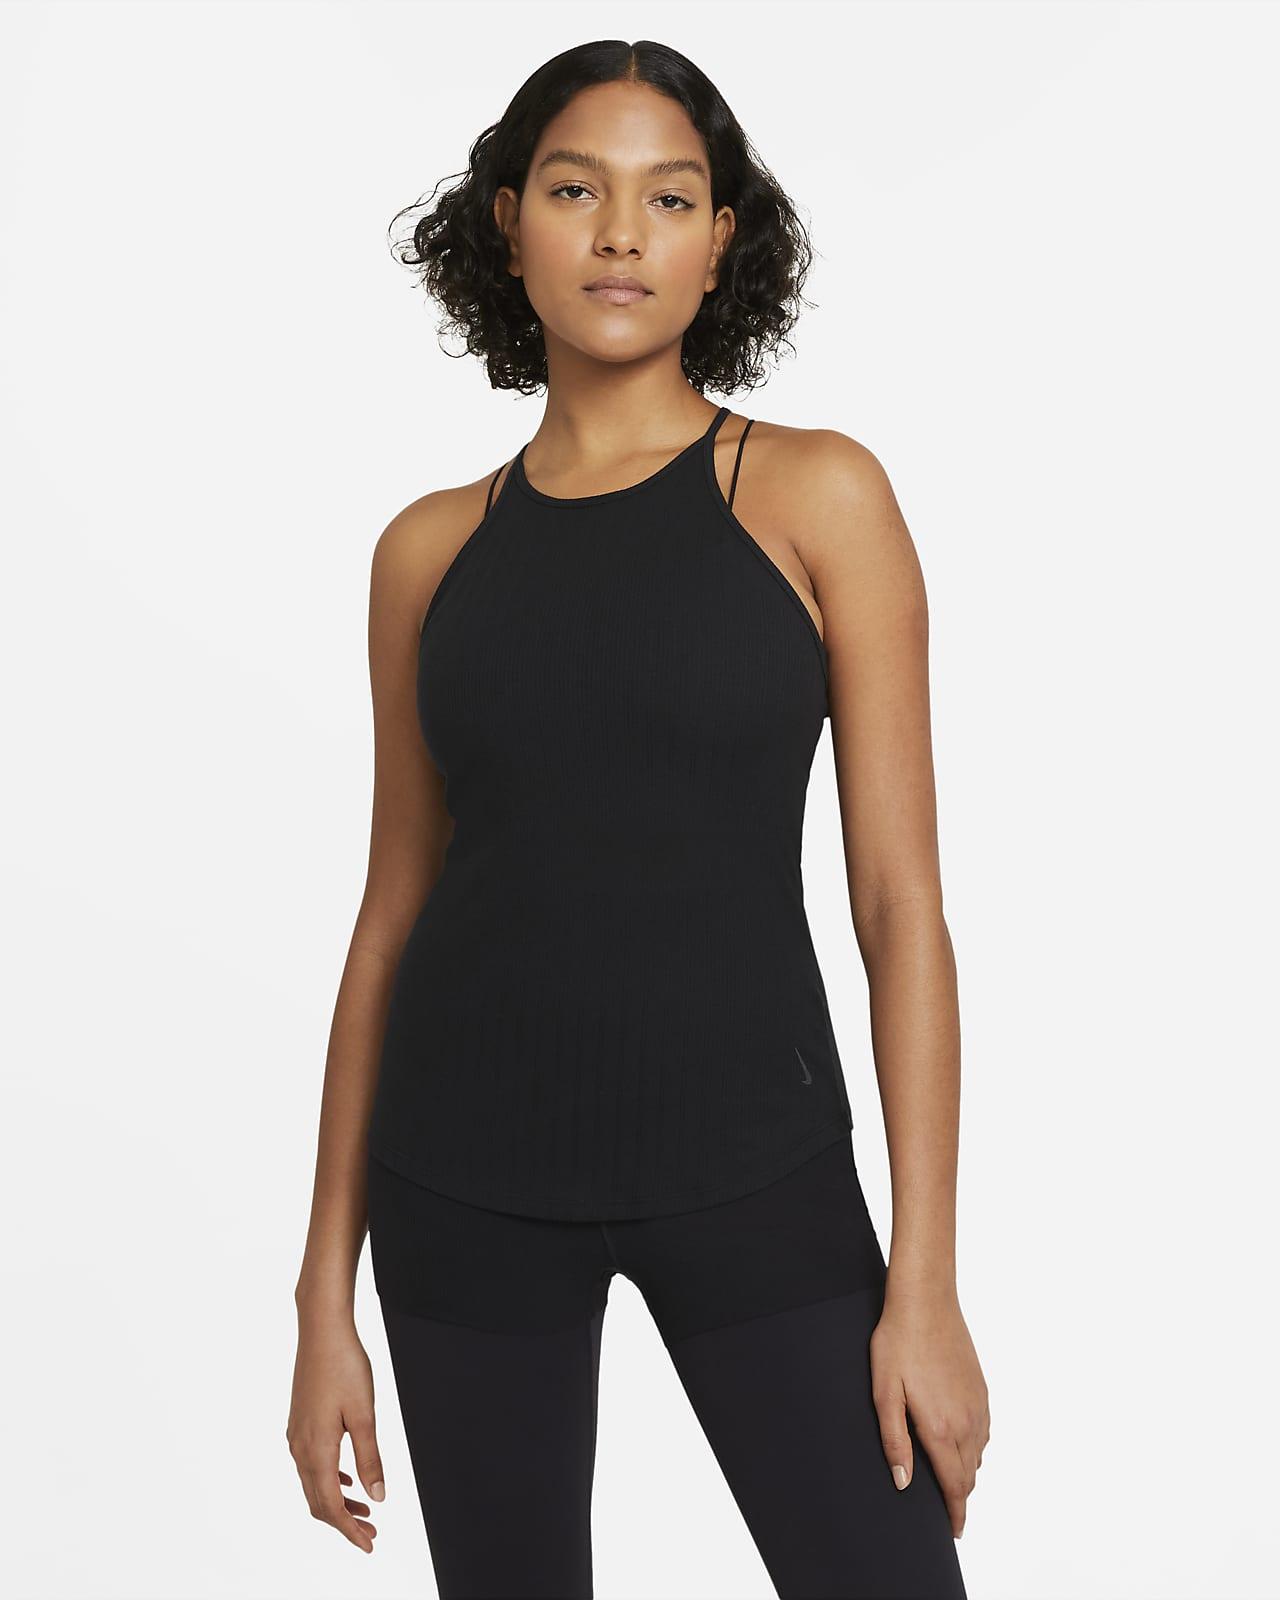 Linne Nike Yoga Pointelle för kvinnor